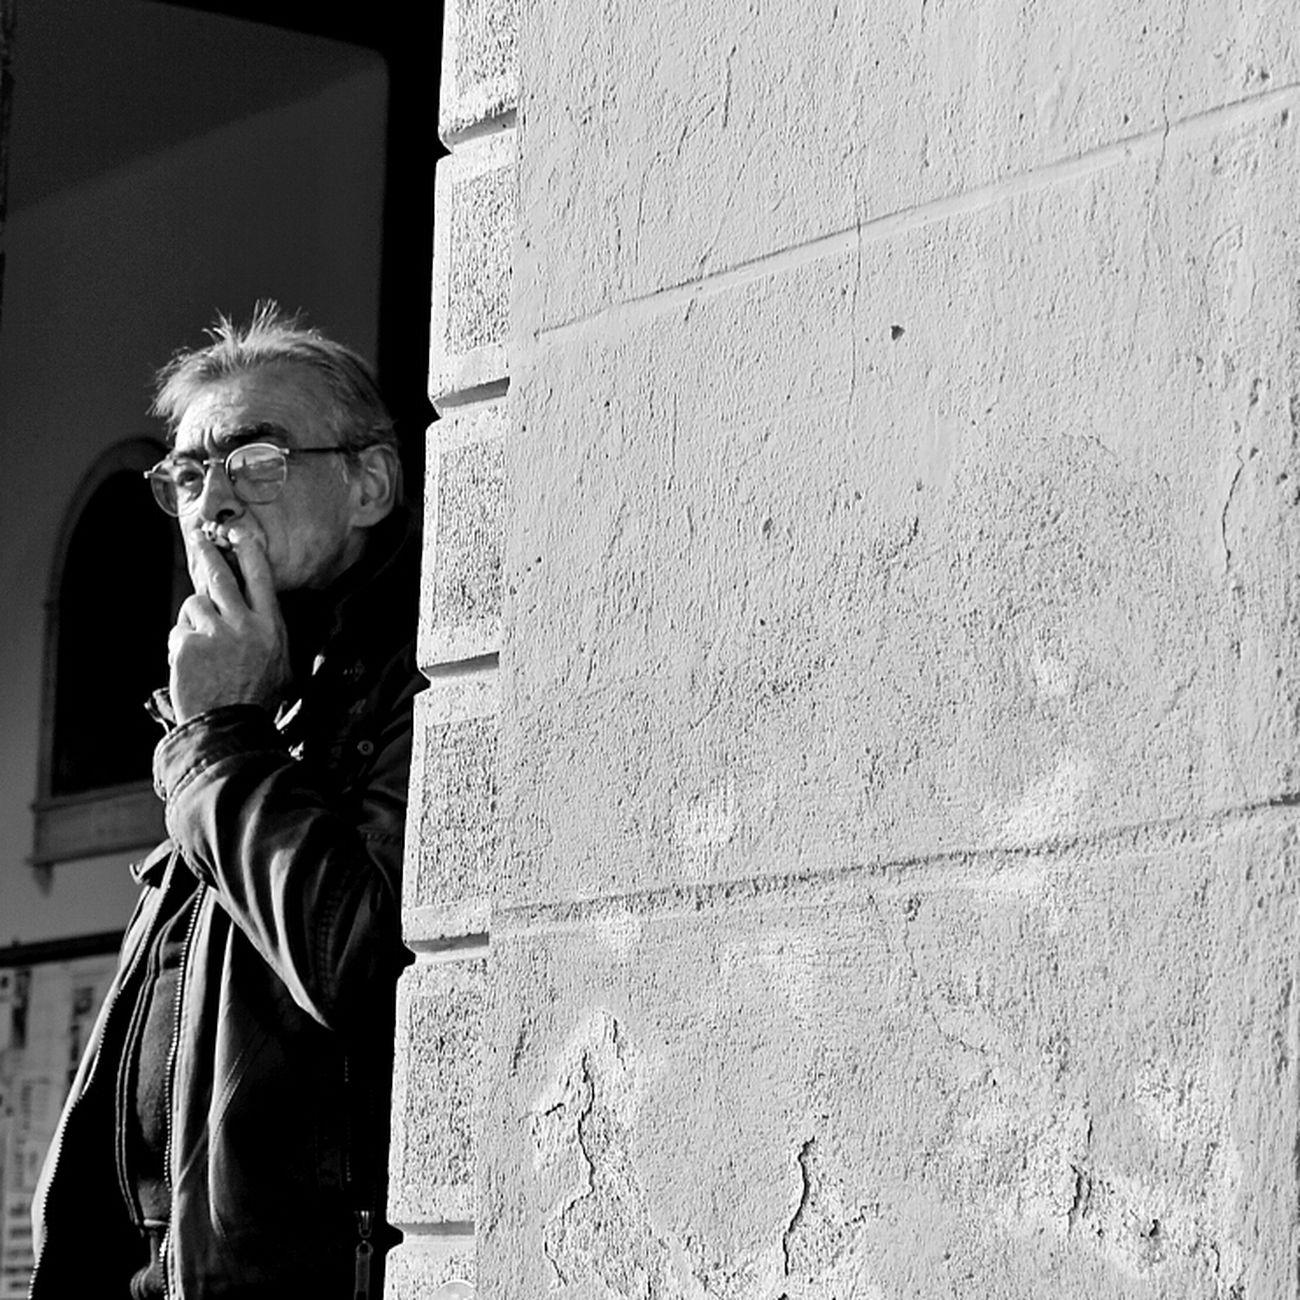 Streetphotography Blackandwhite Portrait Streetphoto_bw Bw_portraits